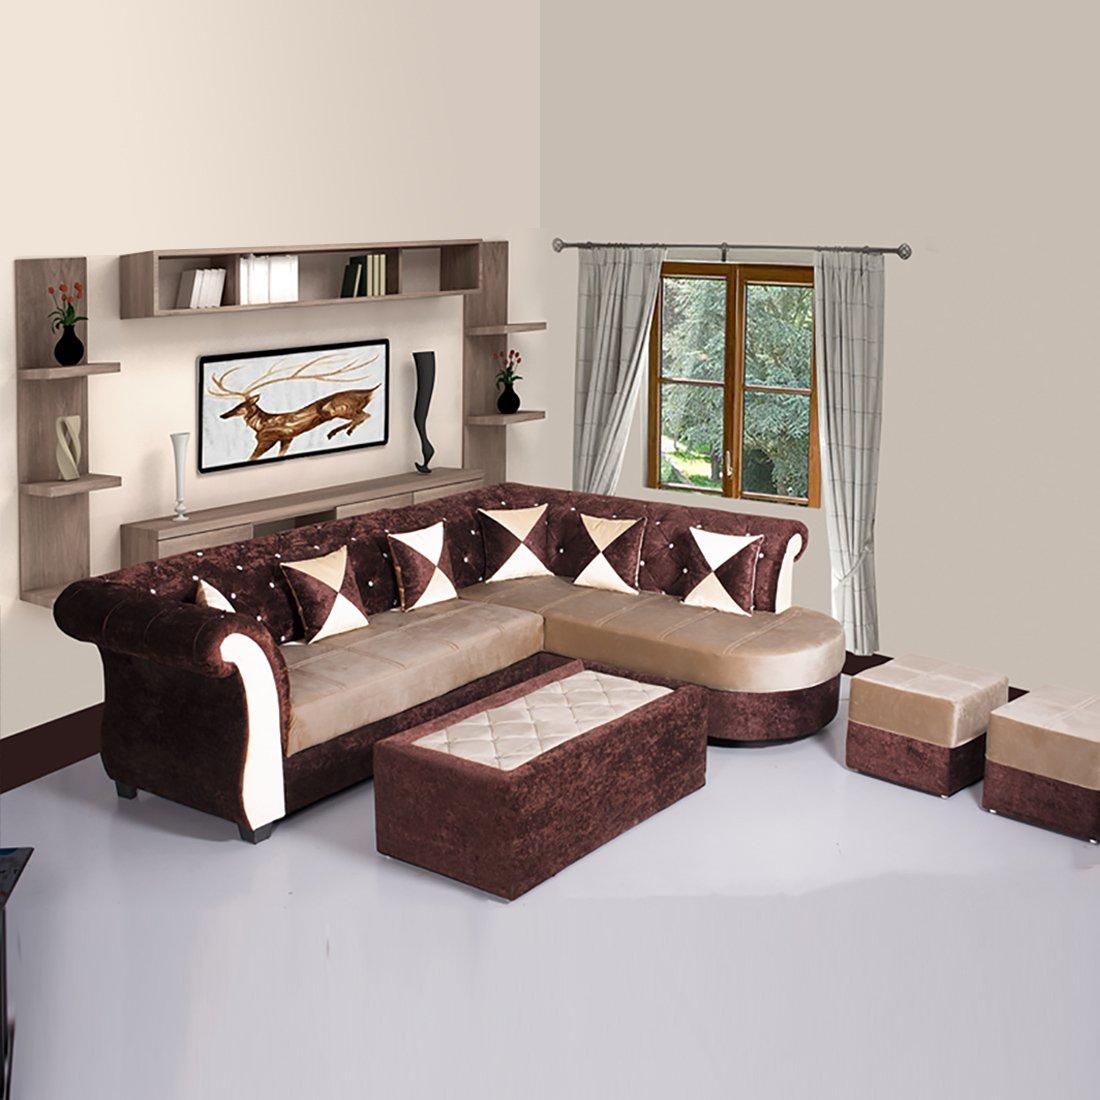 Bharat Lifestyle Dl Diamond Fabric Sectional Cream Brown Sofa Set